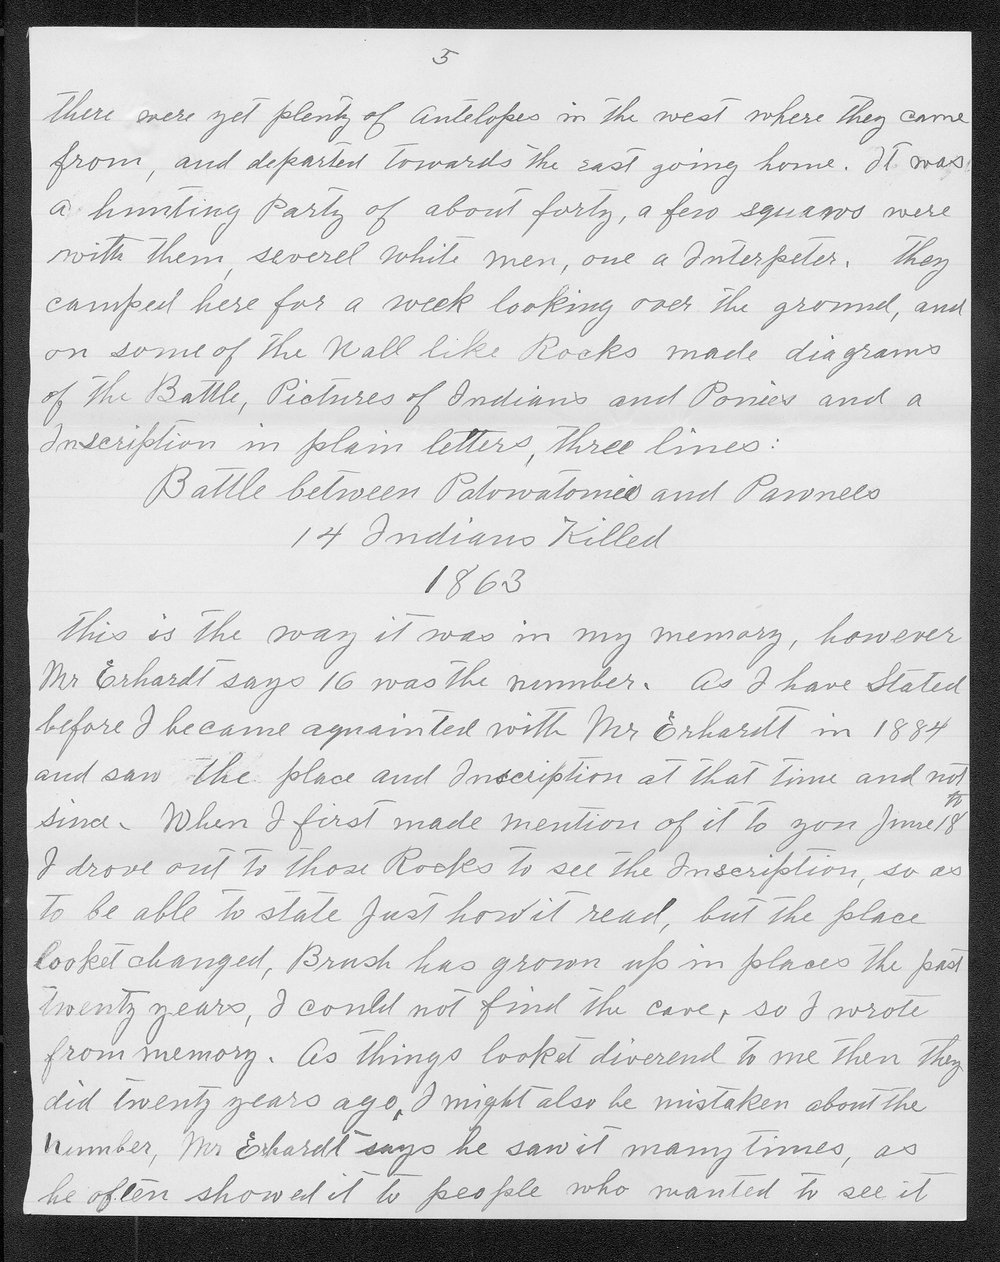 Adolph Roenigk and George W. Martin correspondence - 5